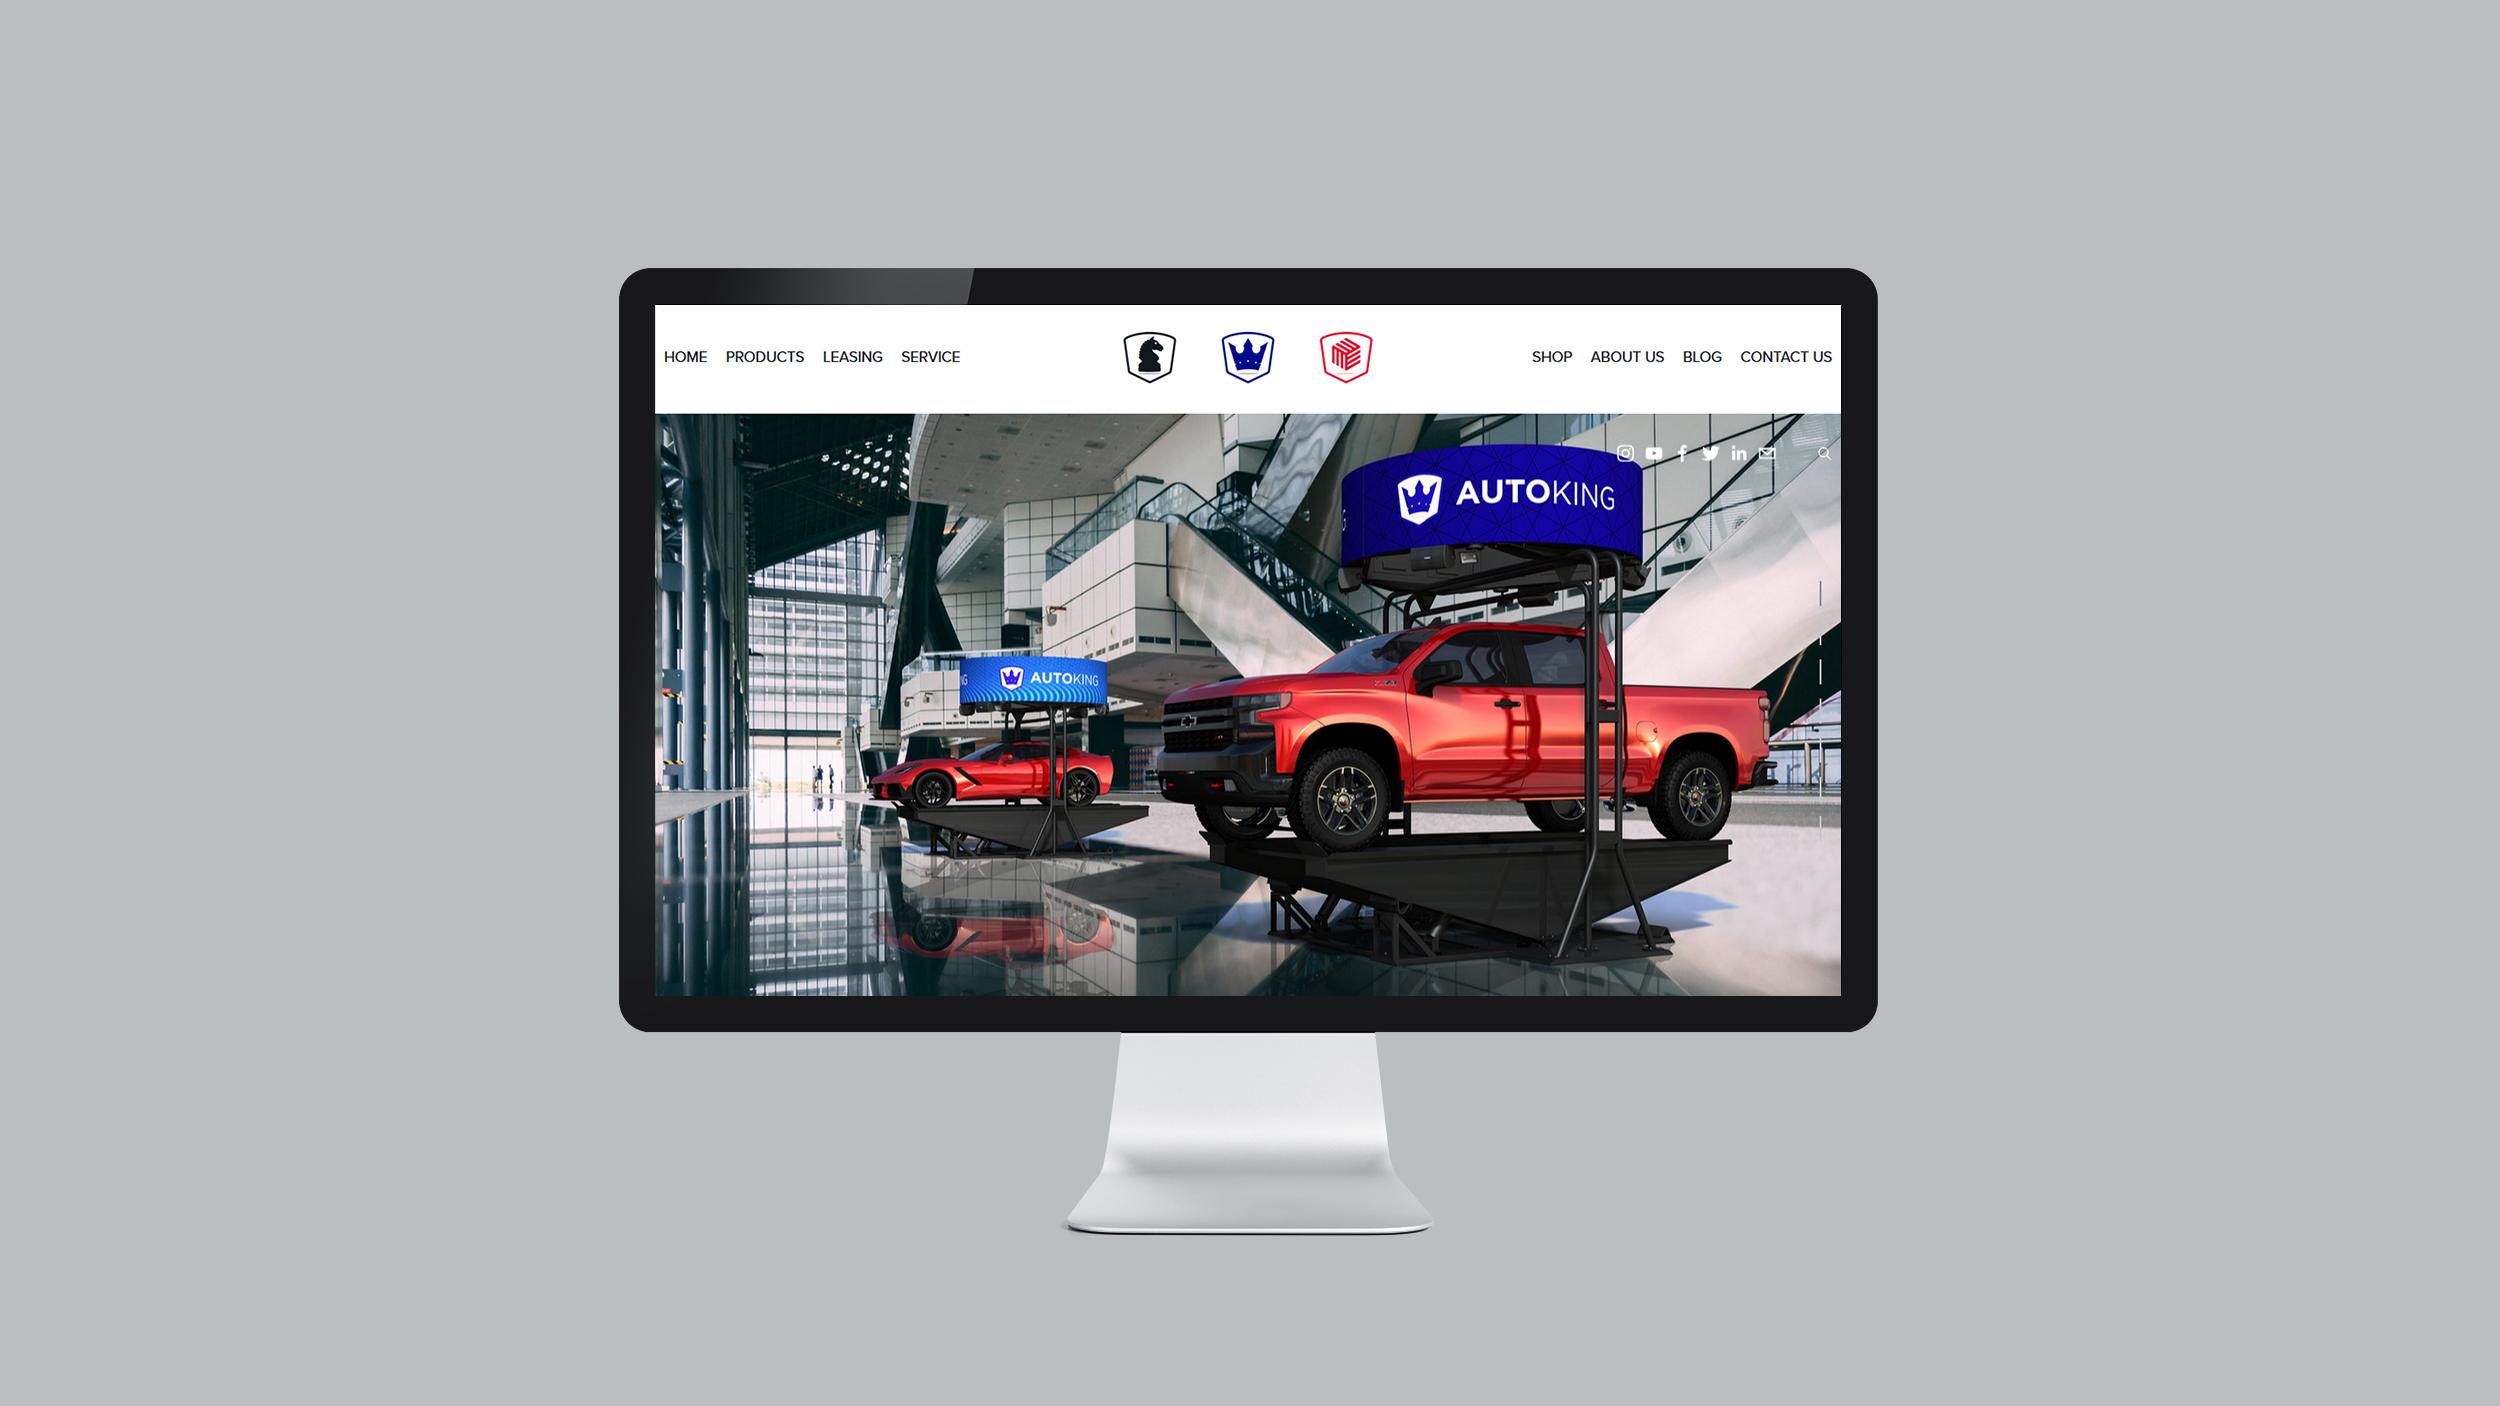 Auto_King_website.jpg